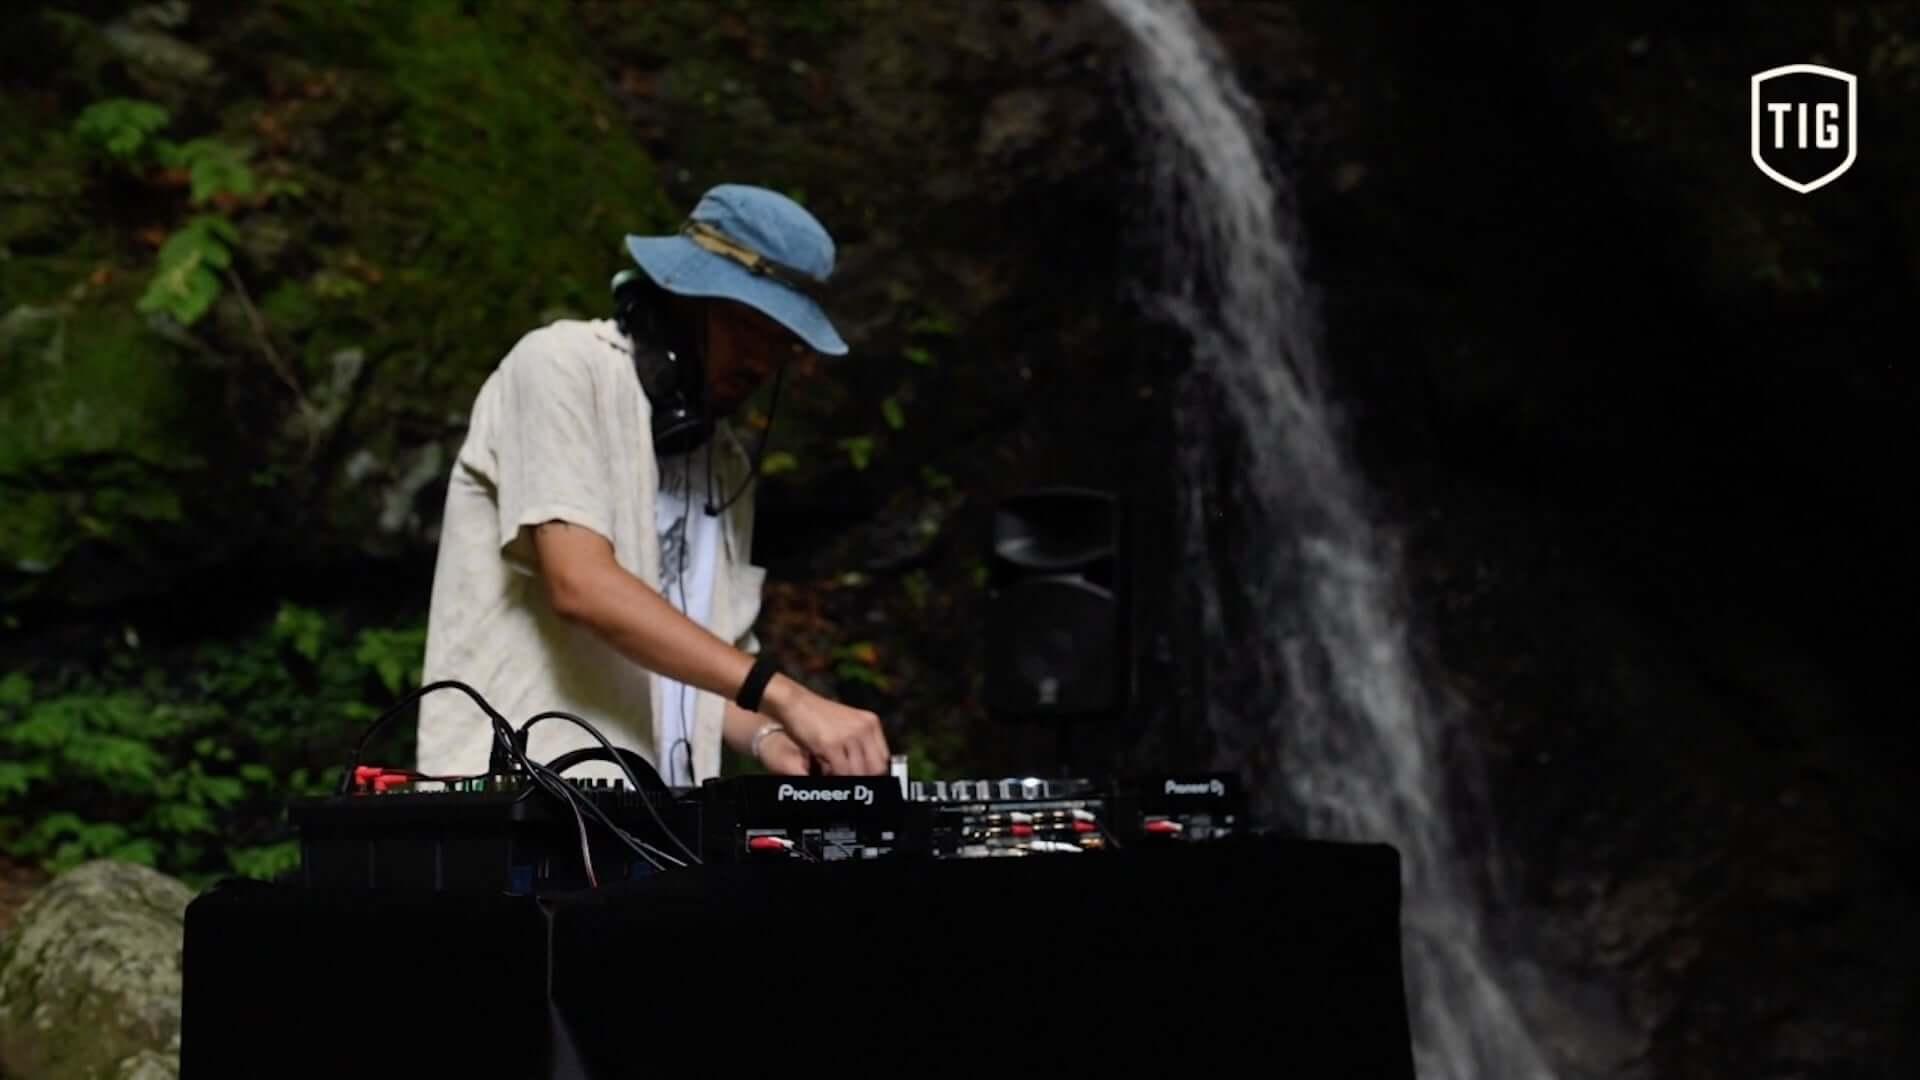 J.A.K.A.M.、Kaoru Inoue、starRoらが日本の自然遺産・文化遺産から音楽を発信!YouTubeチャンネル「THAT IS GOOD」が開設 art201014_thatisgood_12-1920x1080